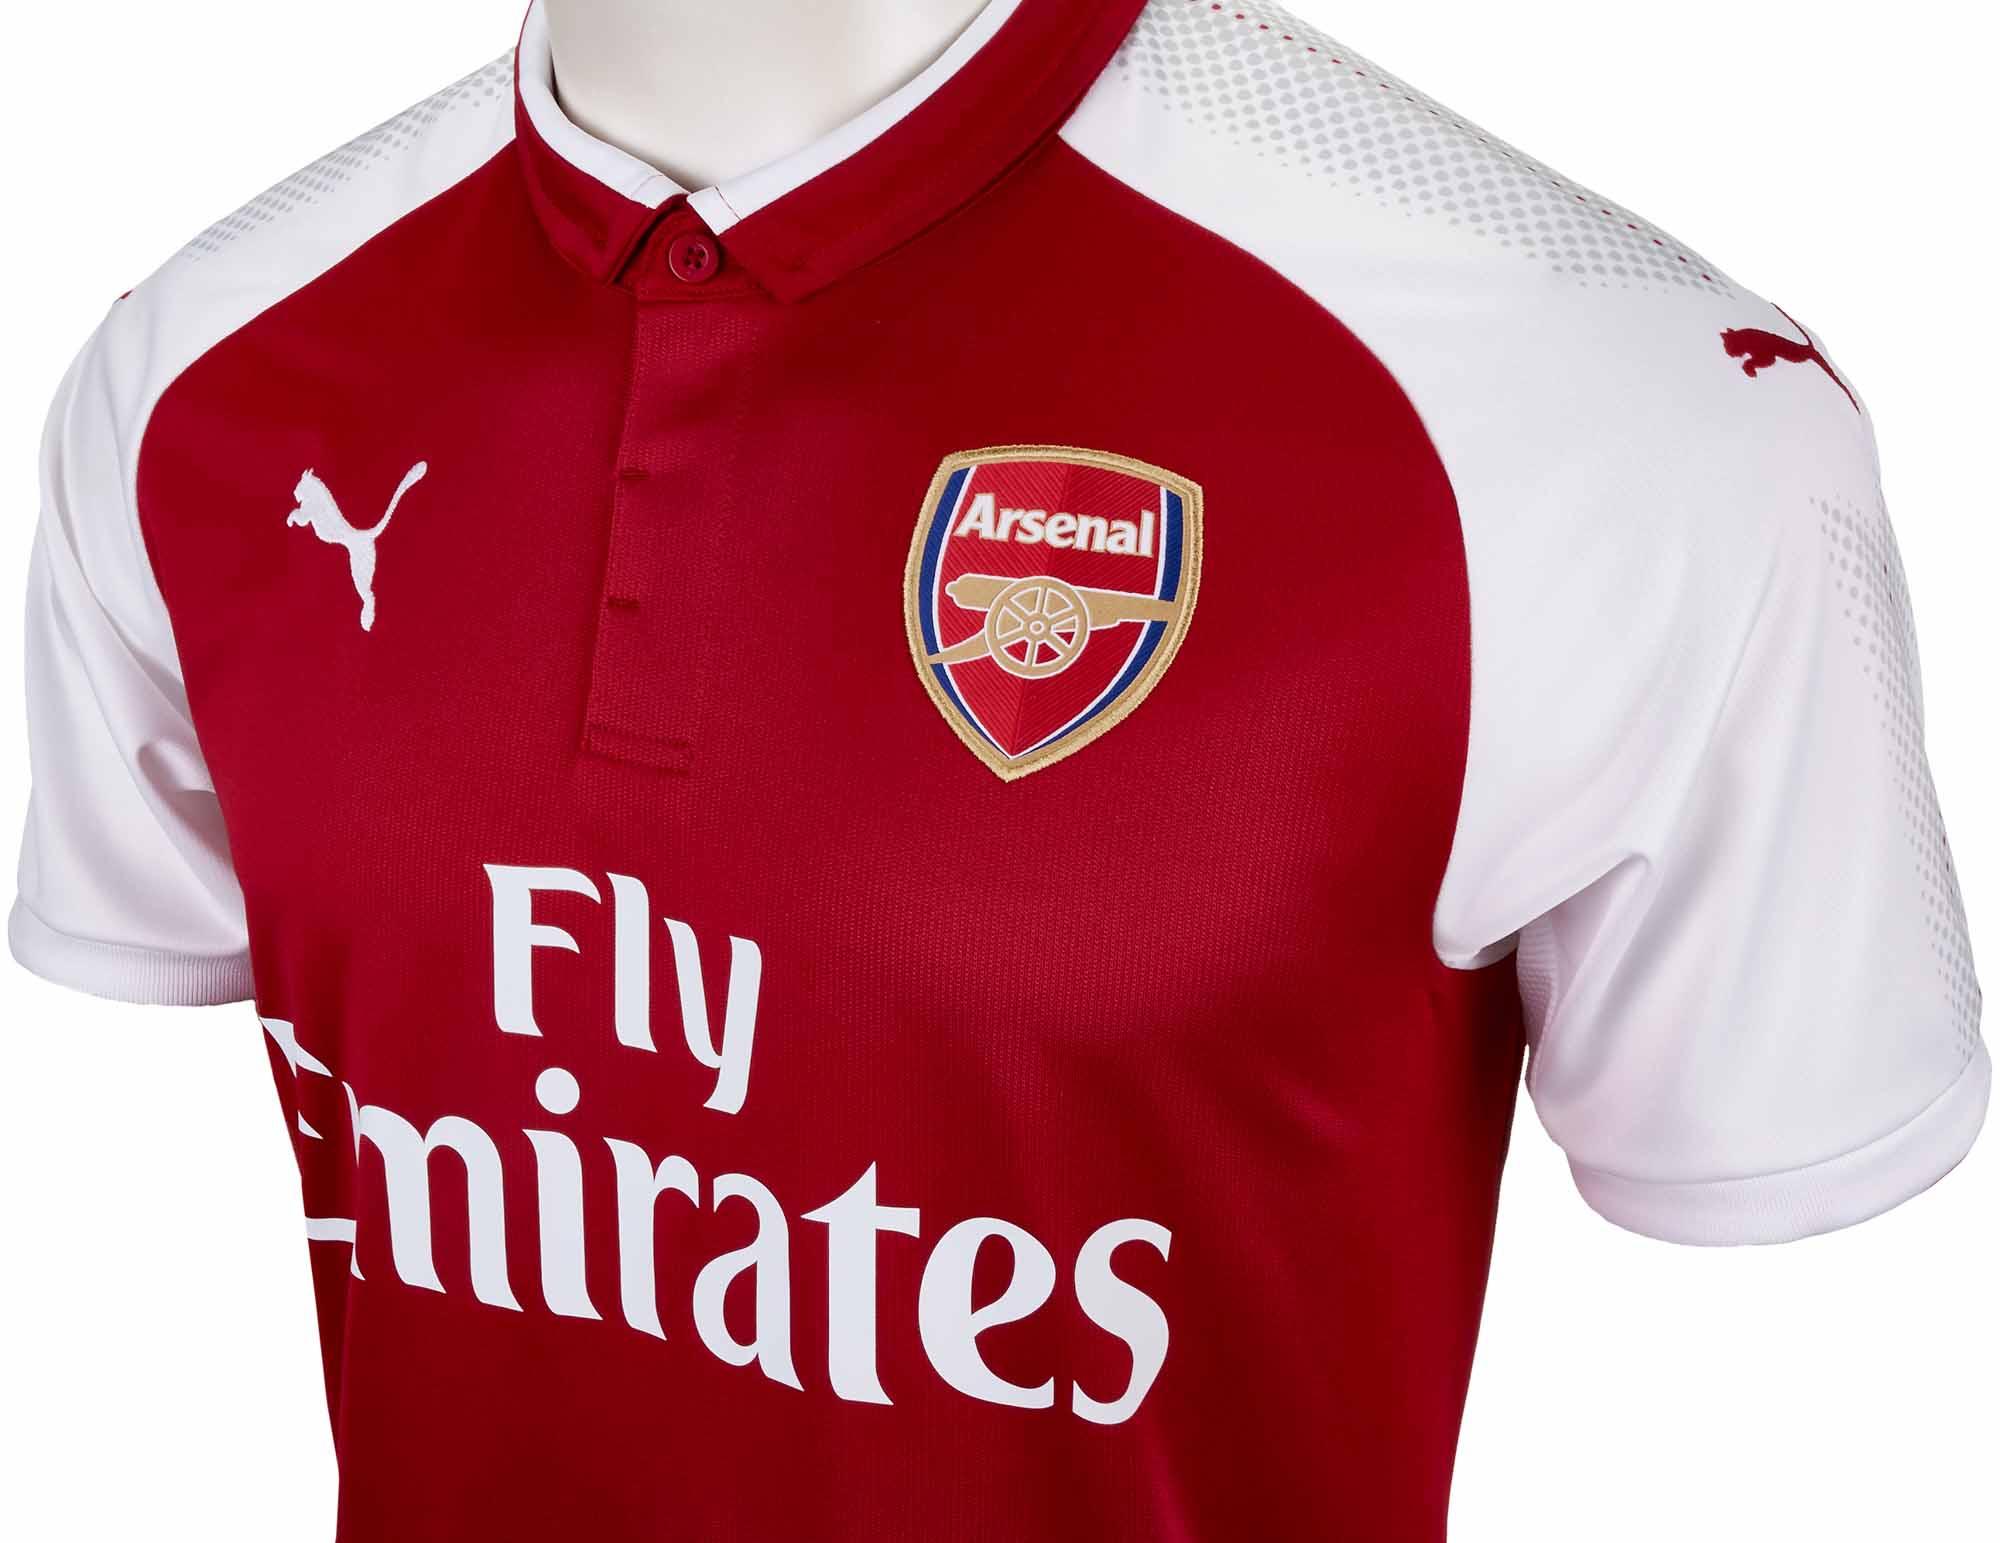 89fa852d0df Arsenal Home Shirt Buy - DREAMWORKS